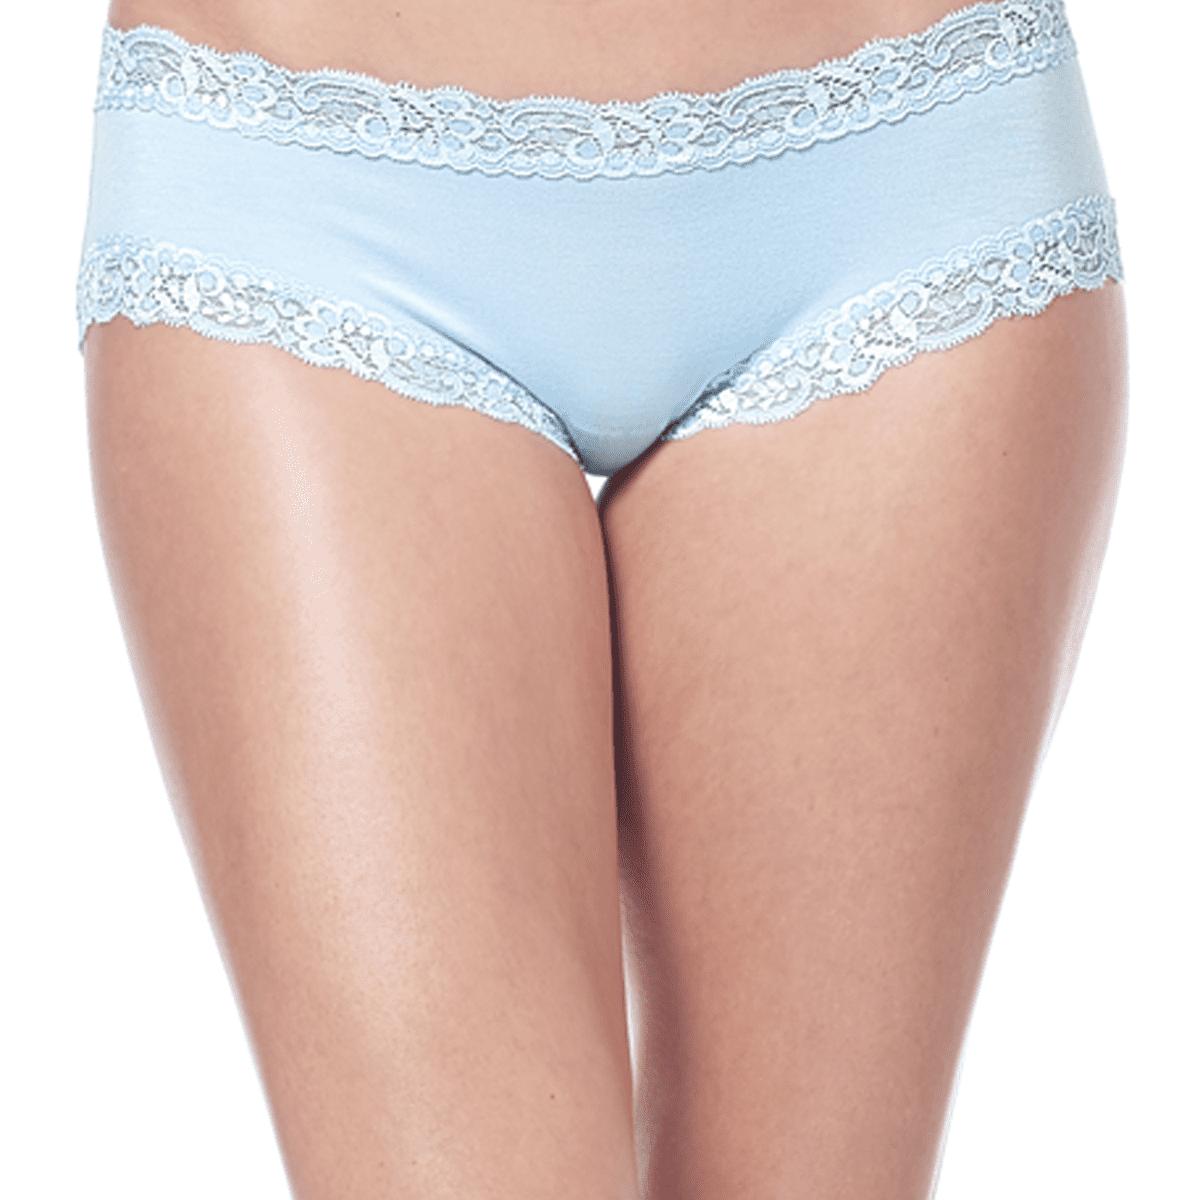 de33ddeea24 Top 10 Comfortable Boy Shorts